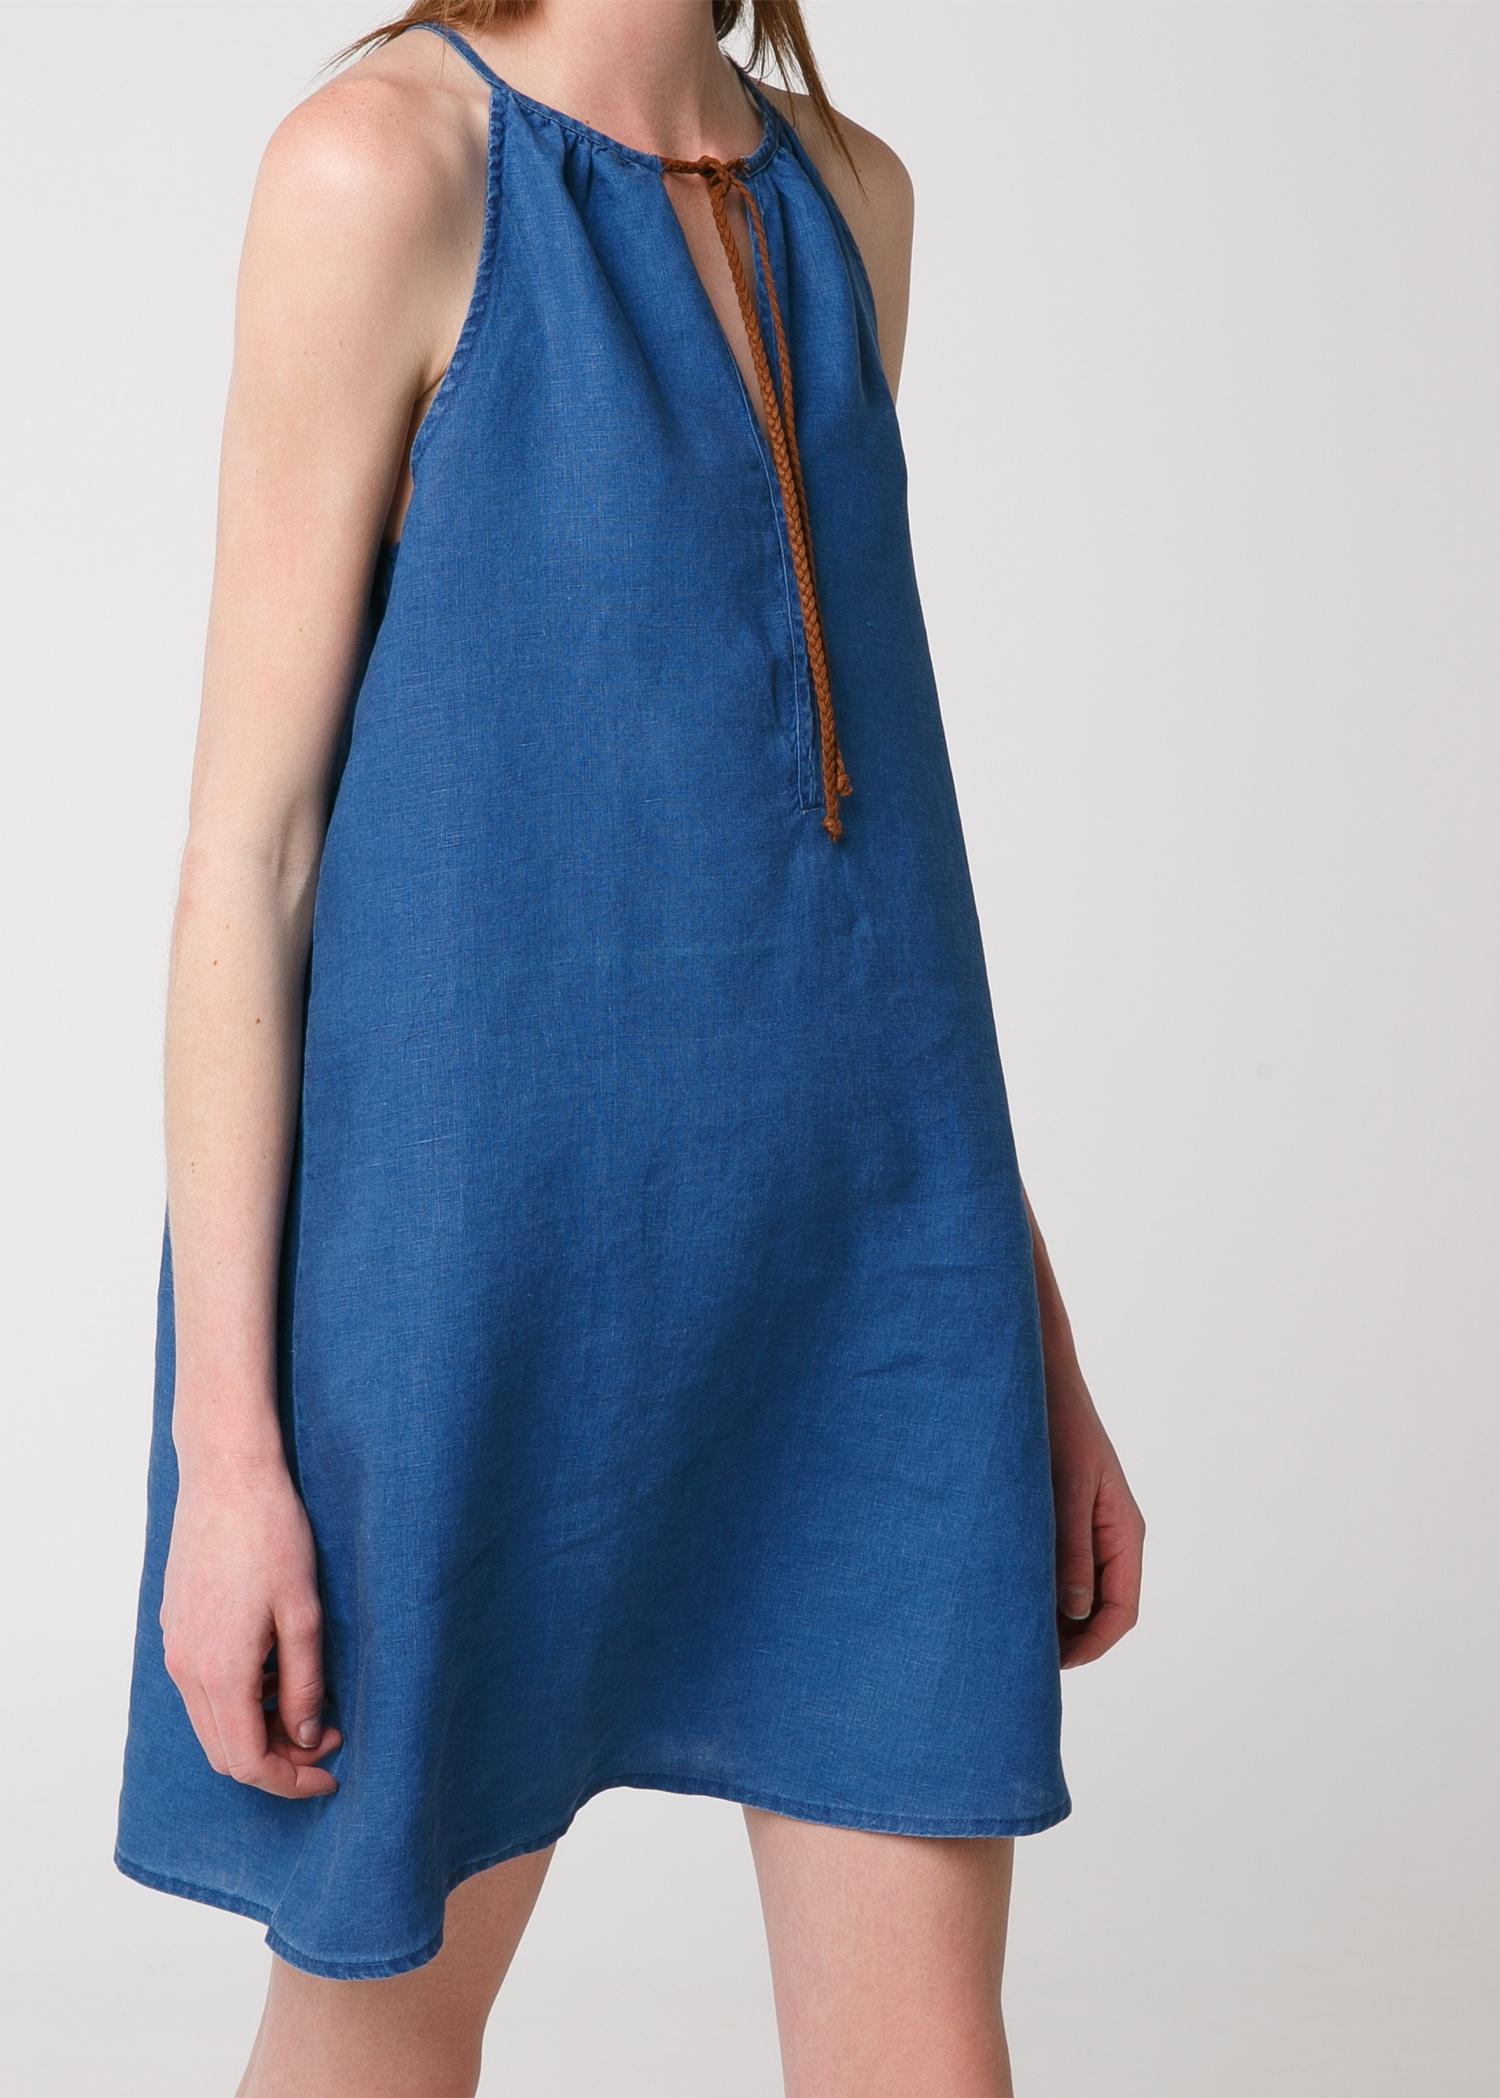 Mango Linen Halter Dress in Blue | Lyst